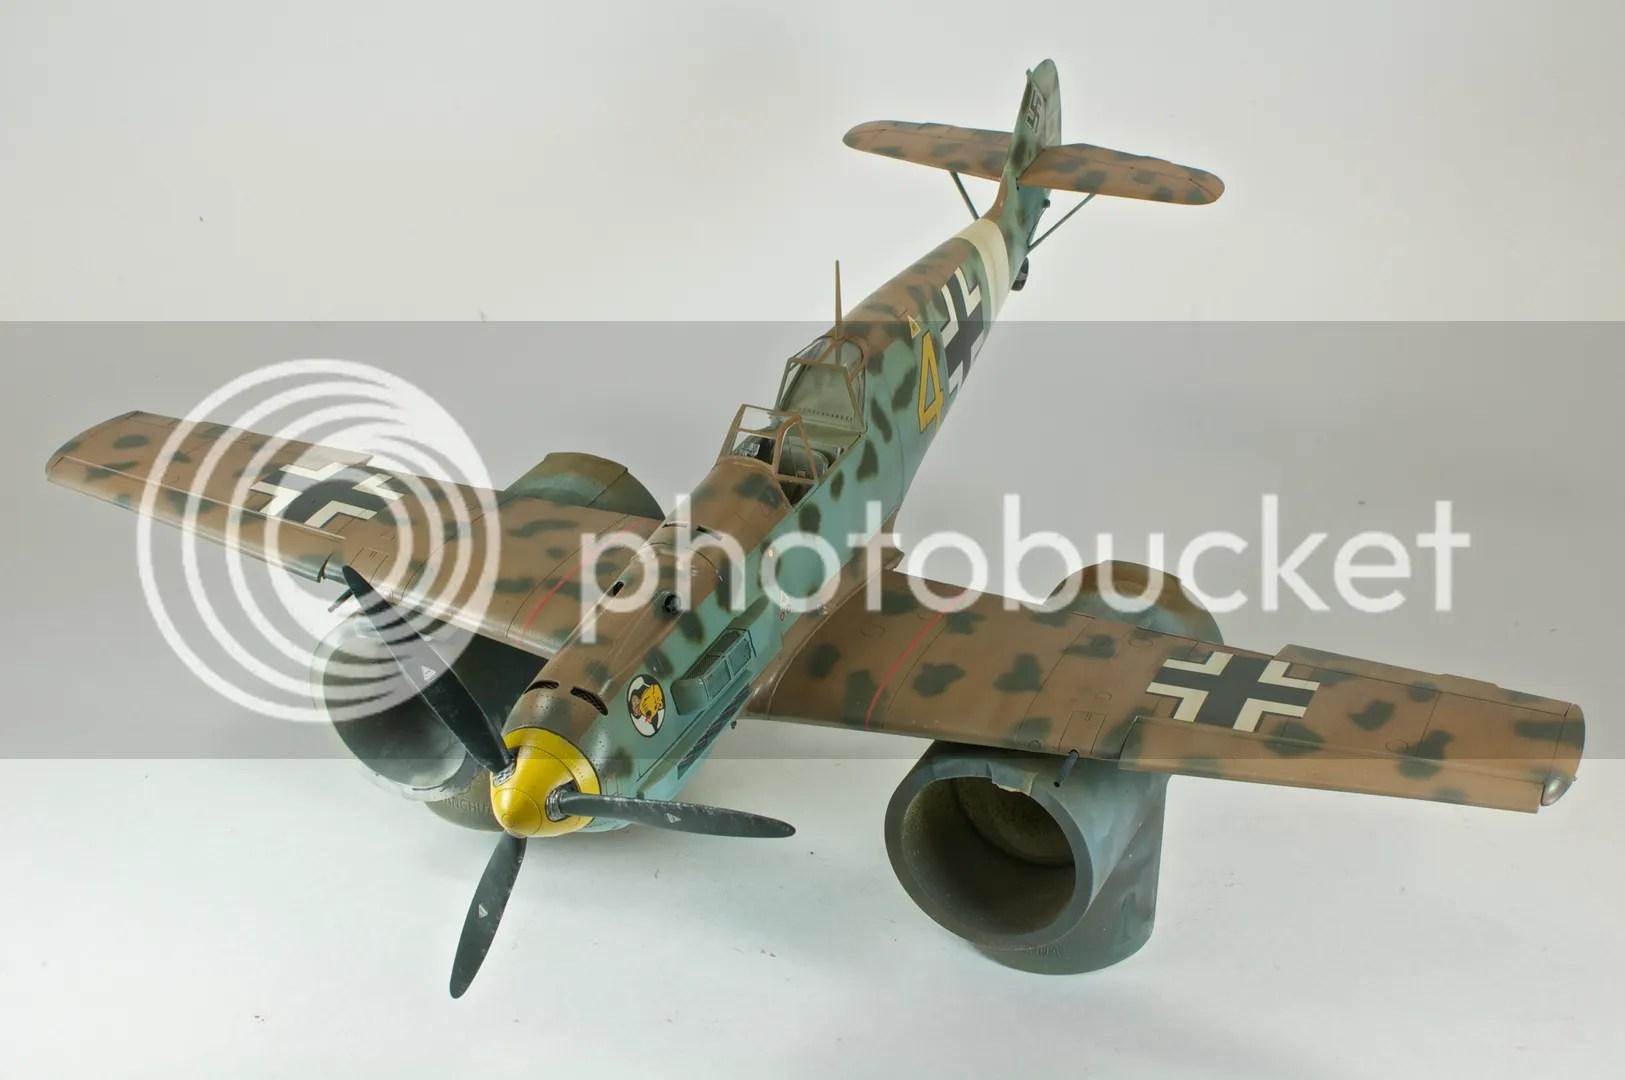 2011,Eduard,1/32,Bf 109E-7 Trop,February,Nikon D300s,scale models